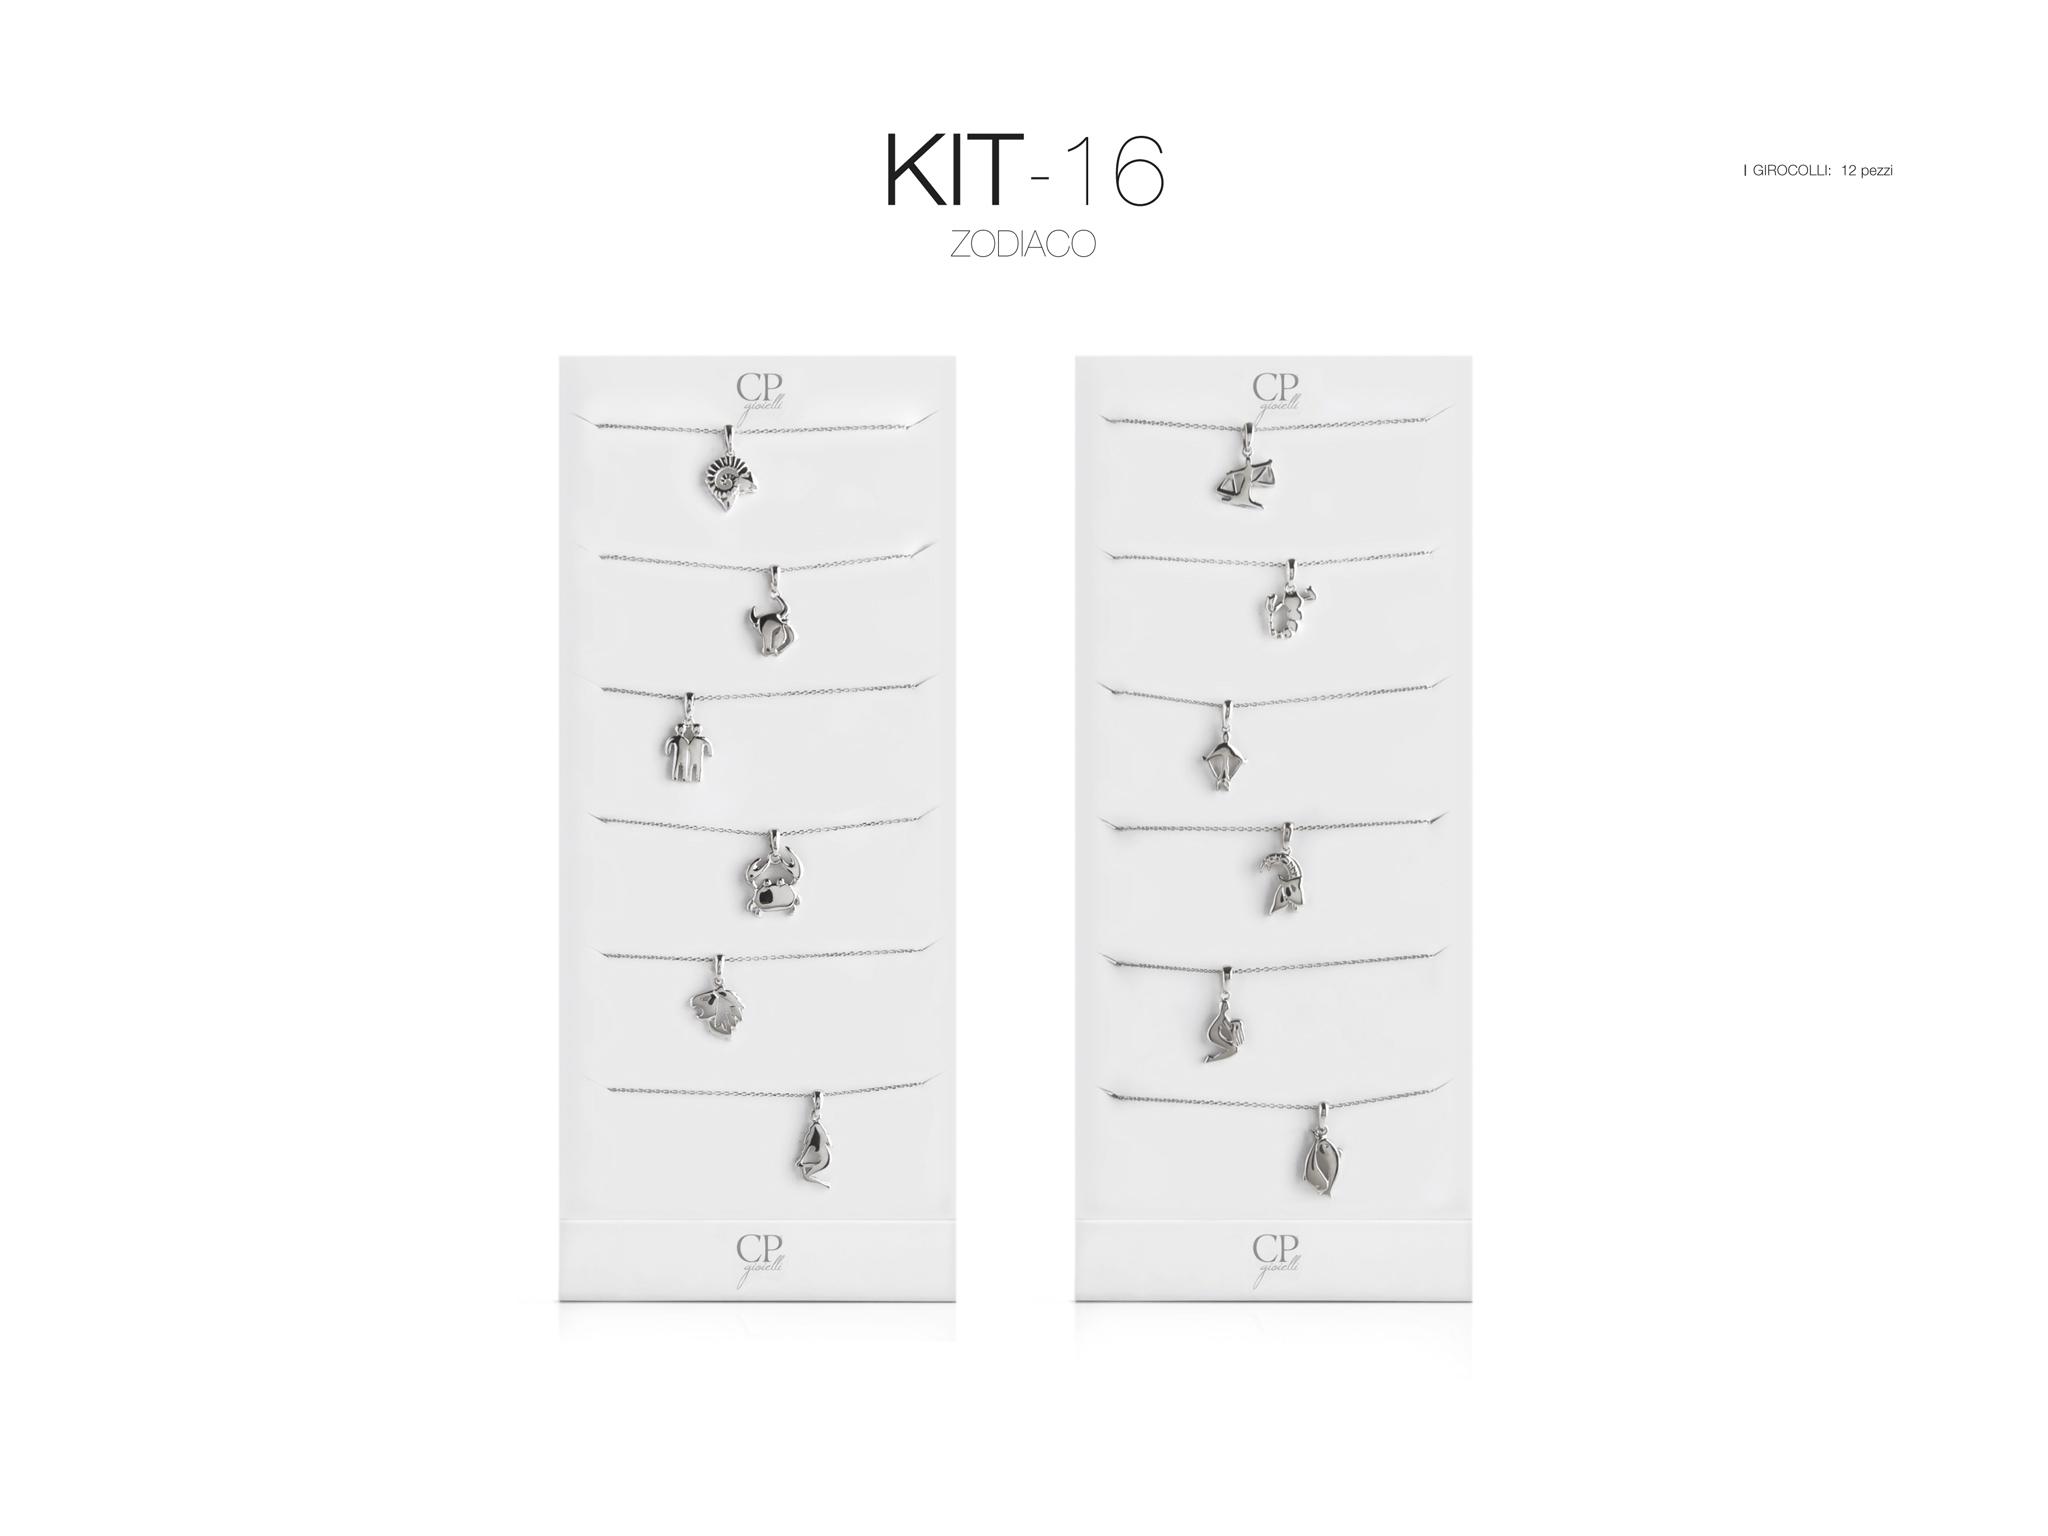 kit_argento_3.0_2016_pagina_54_APP